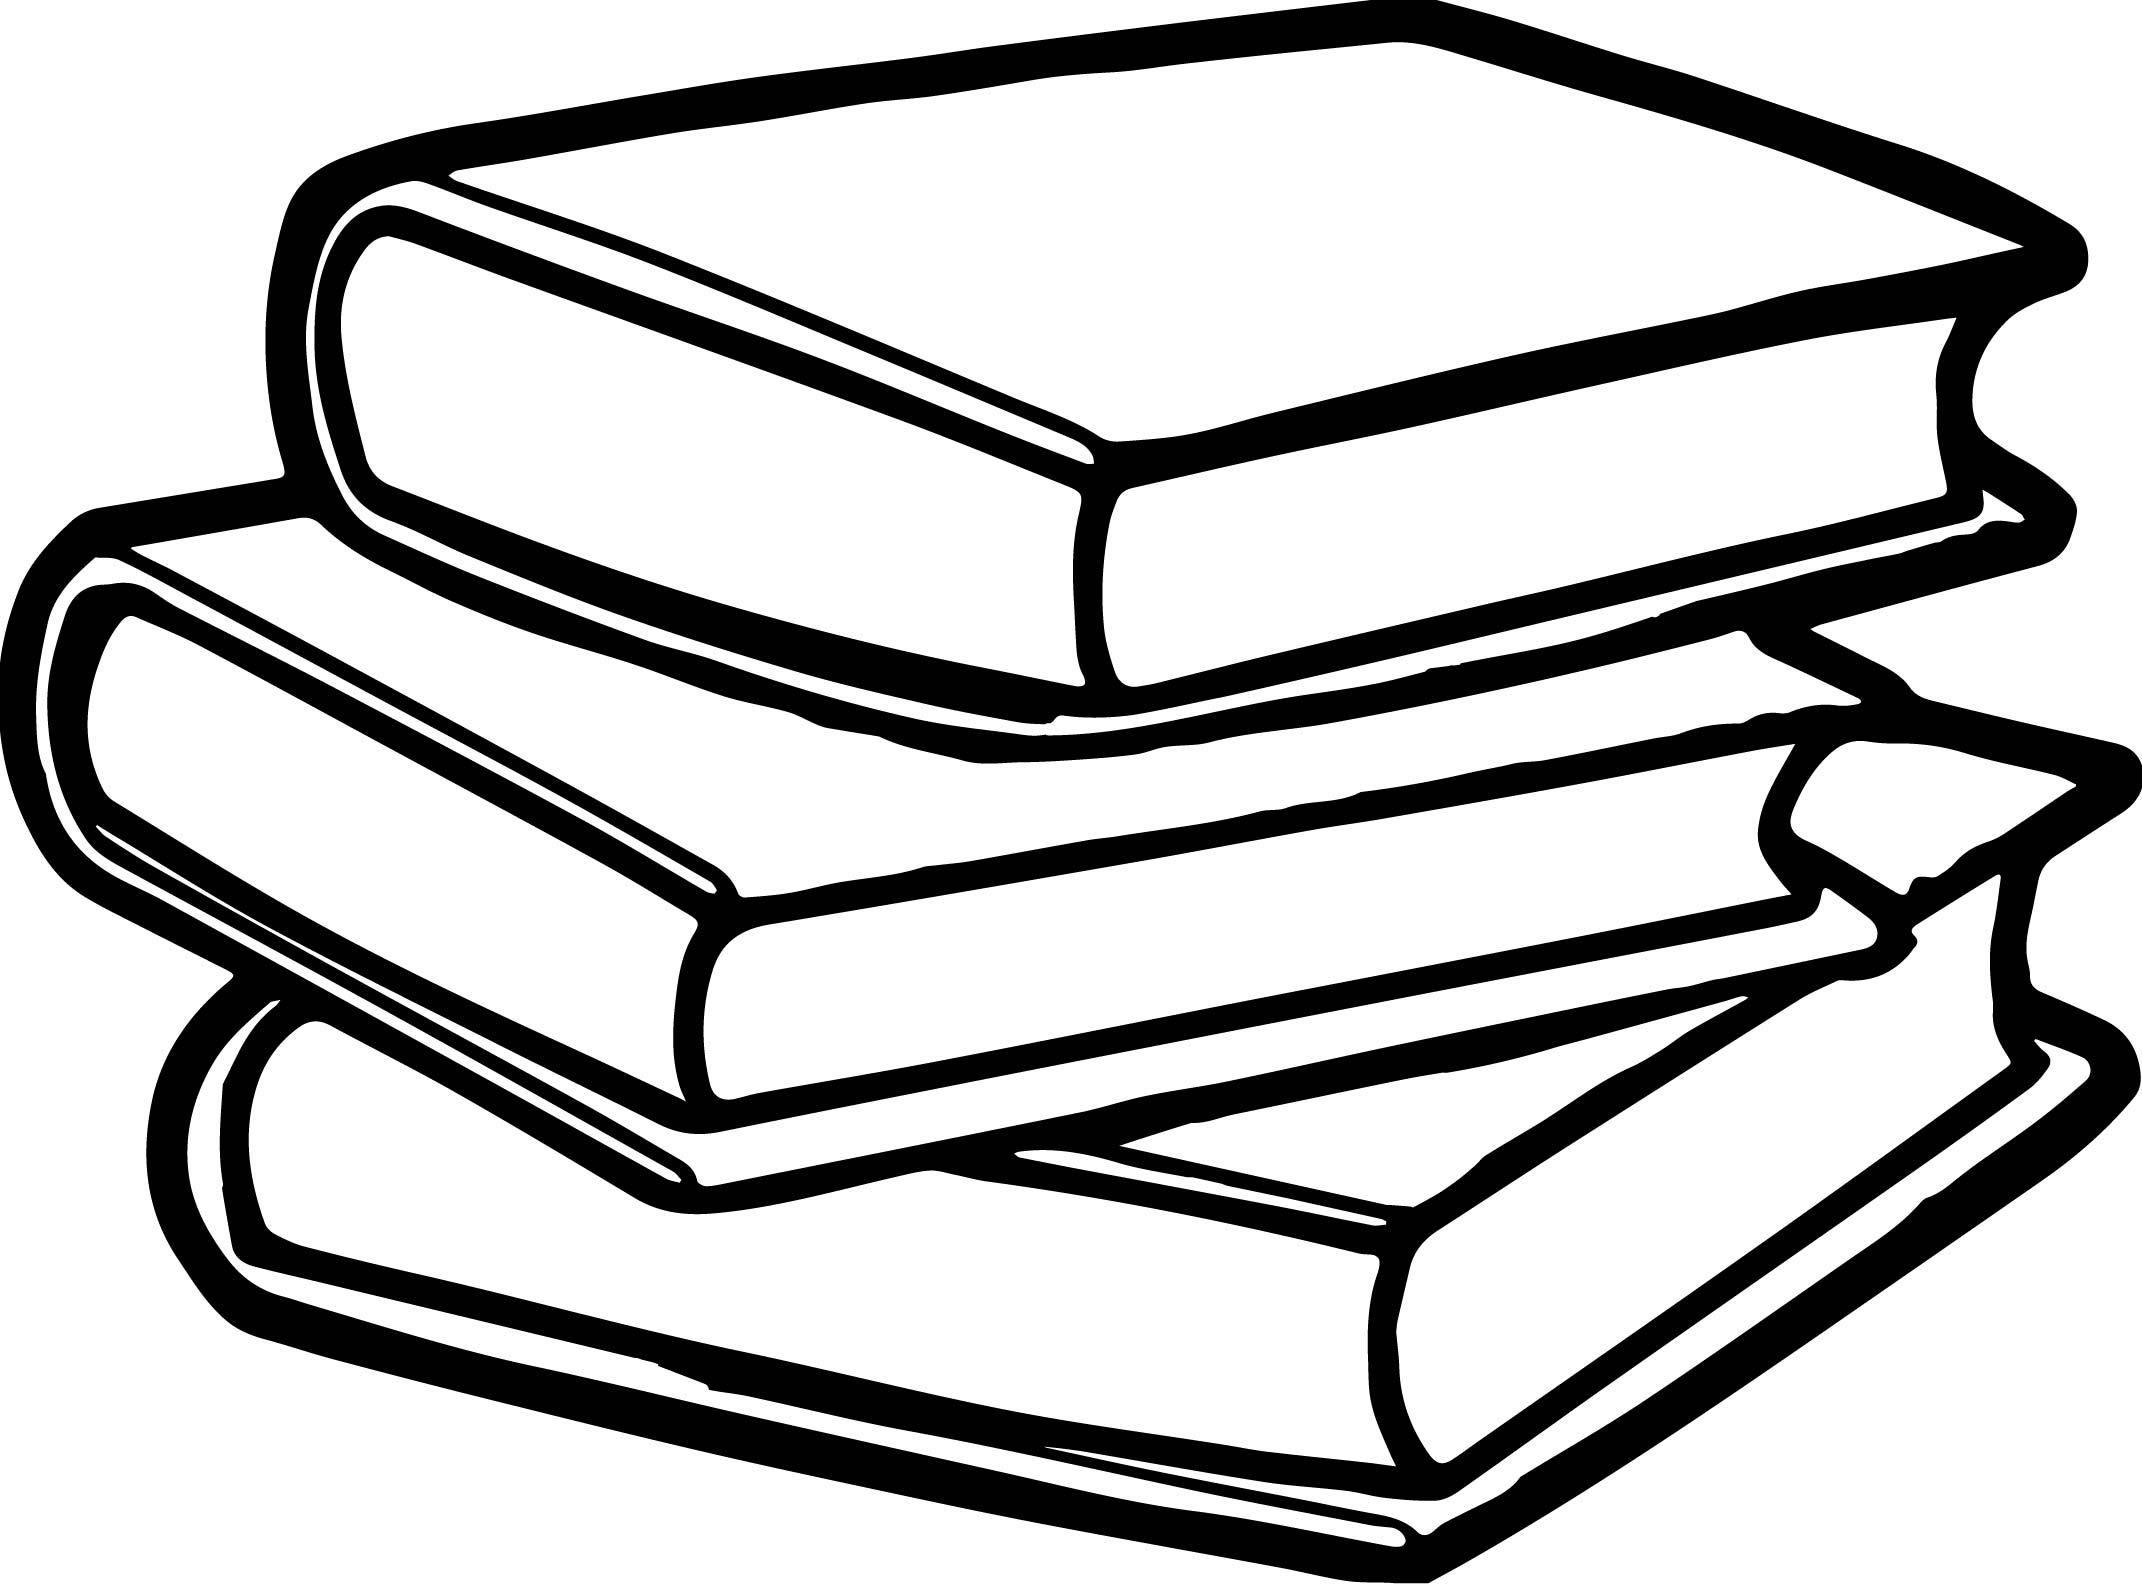 Black And White Books Clipart.